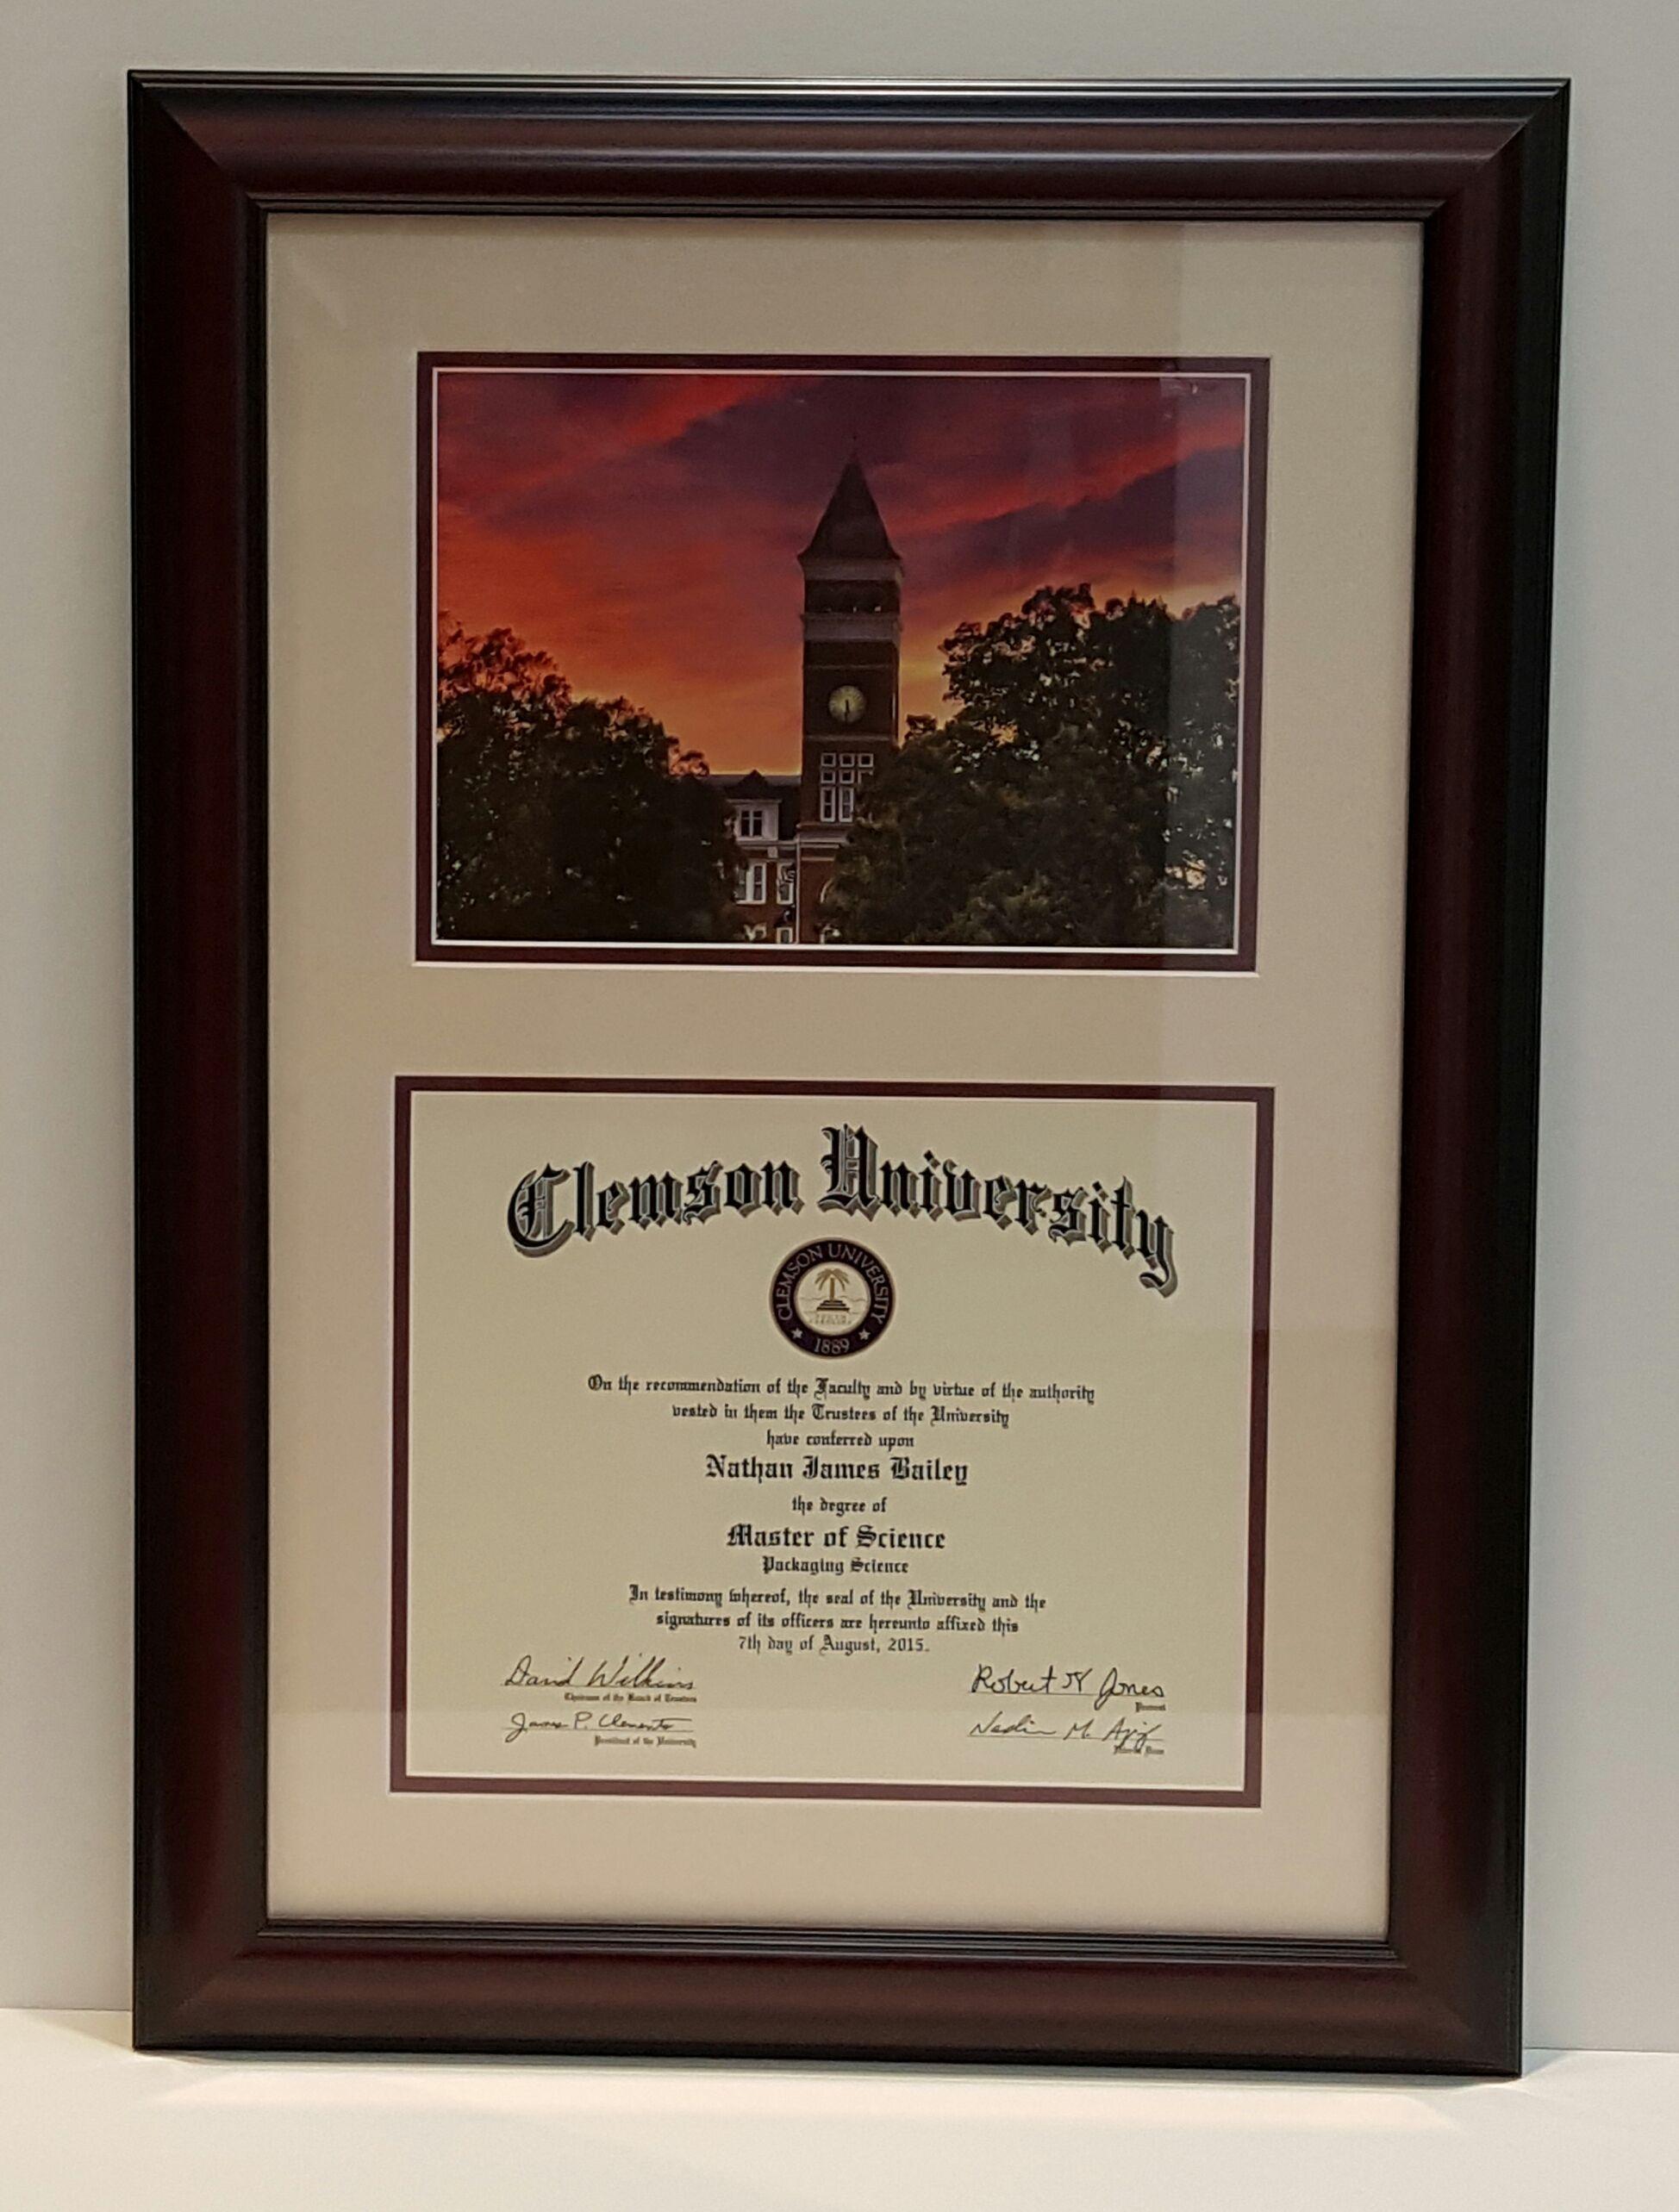 Custom framed diploma and photo of University for St. Louis resident ...